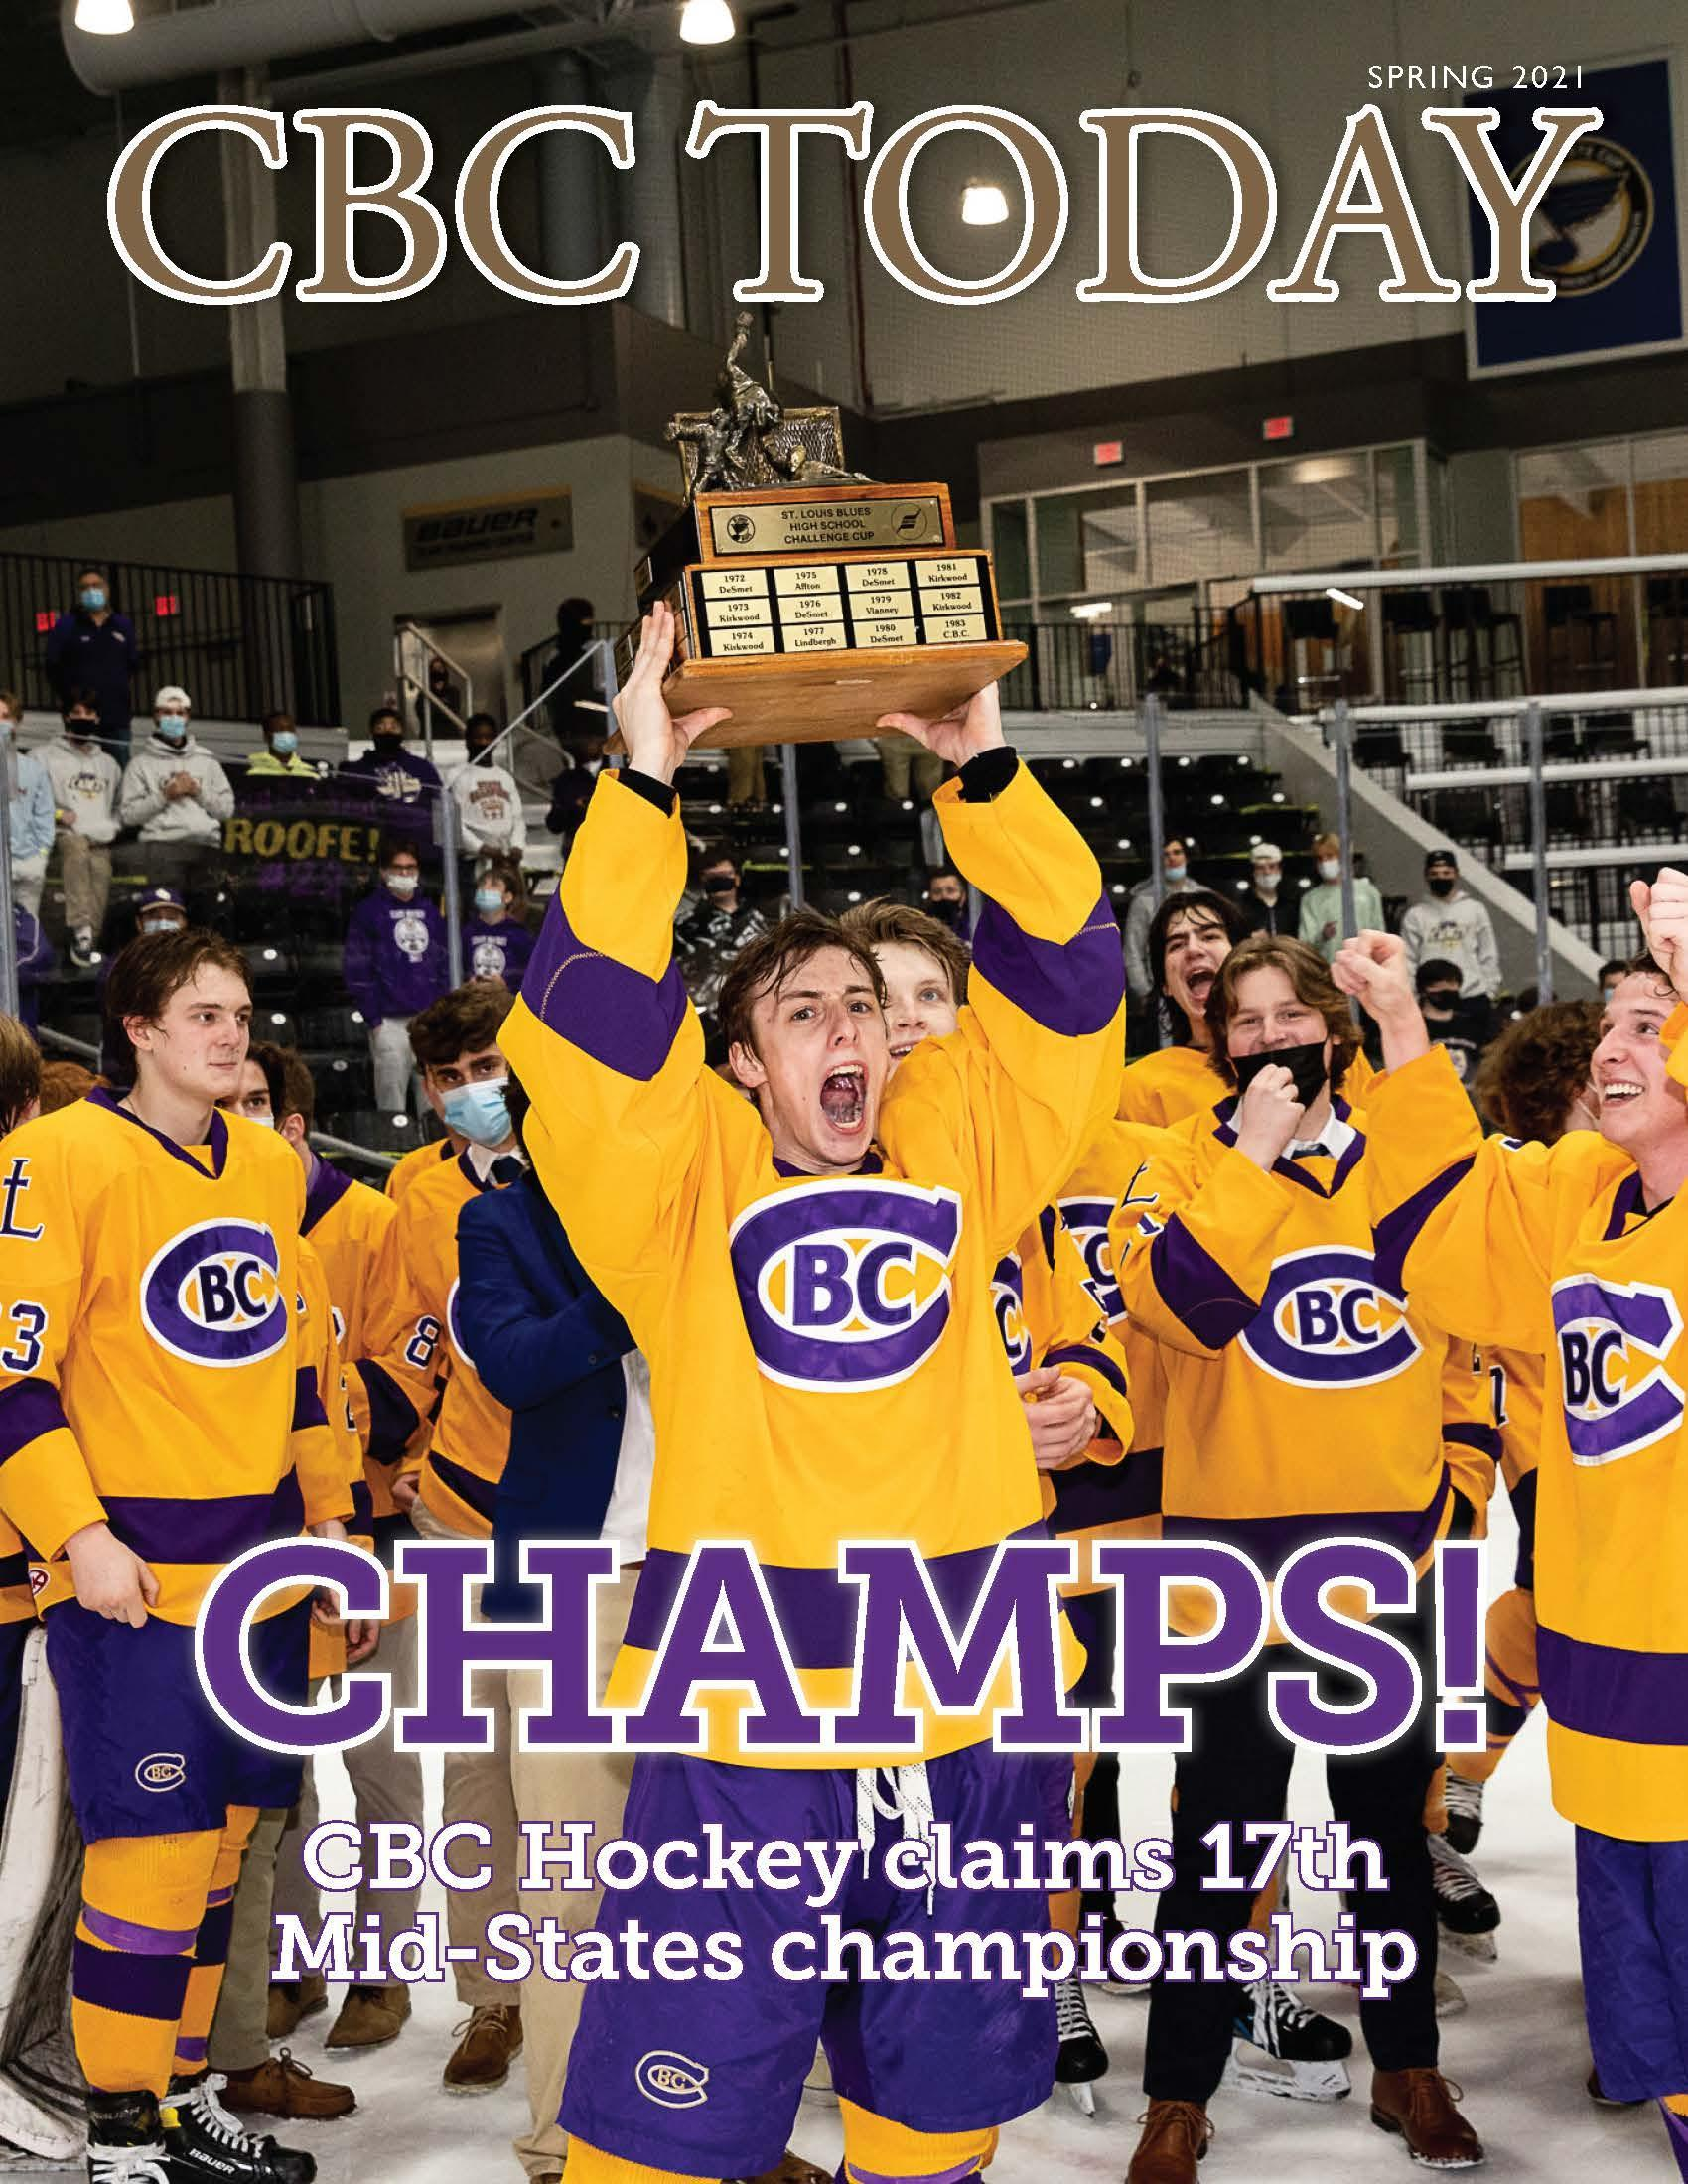 Spring 2021 CBC Today magazine